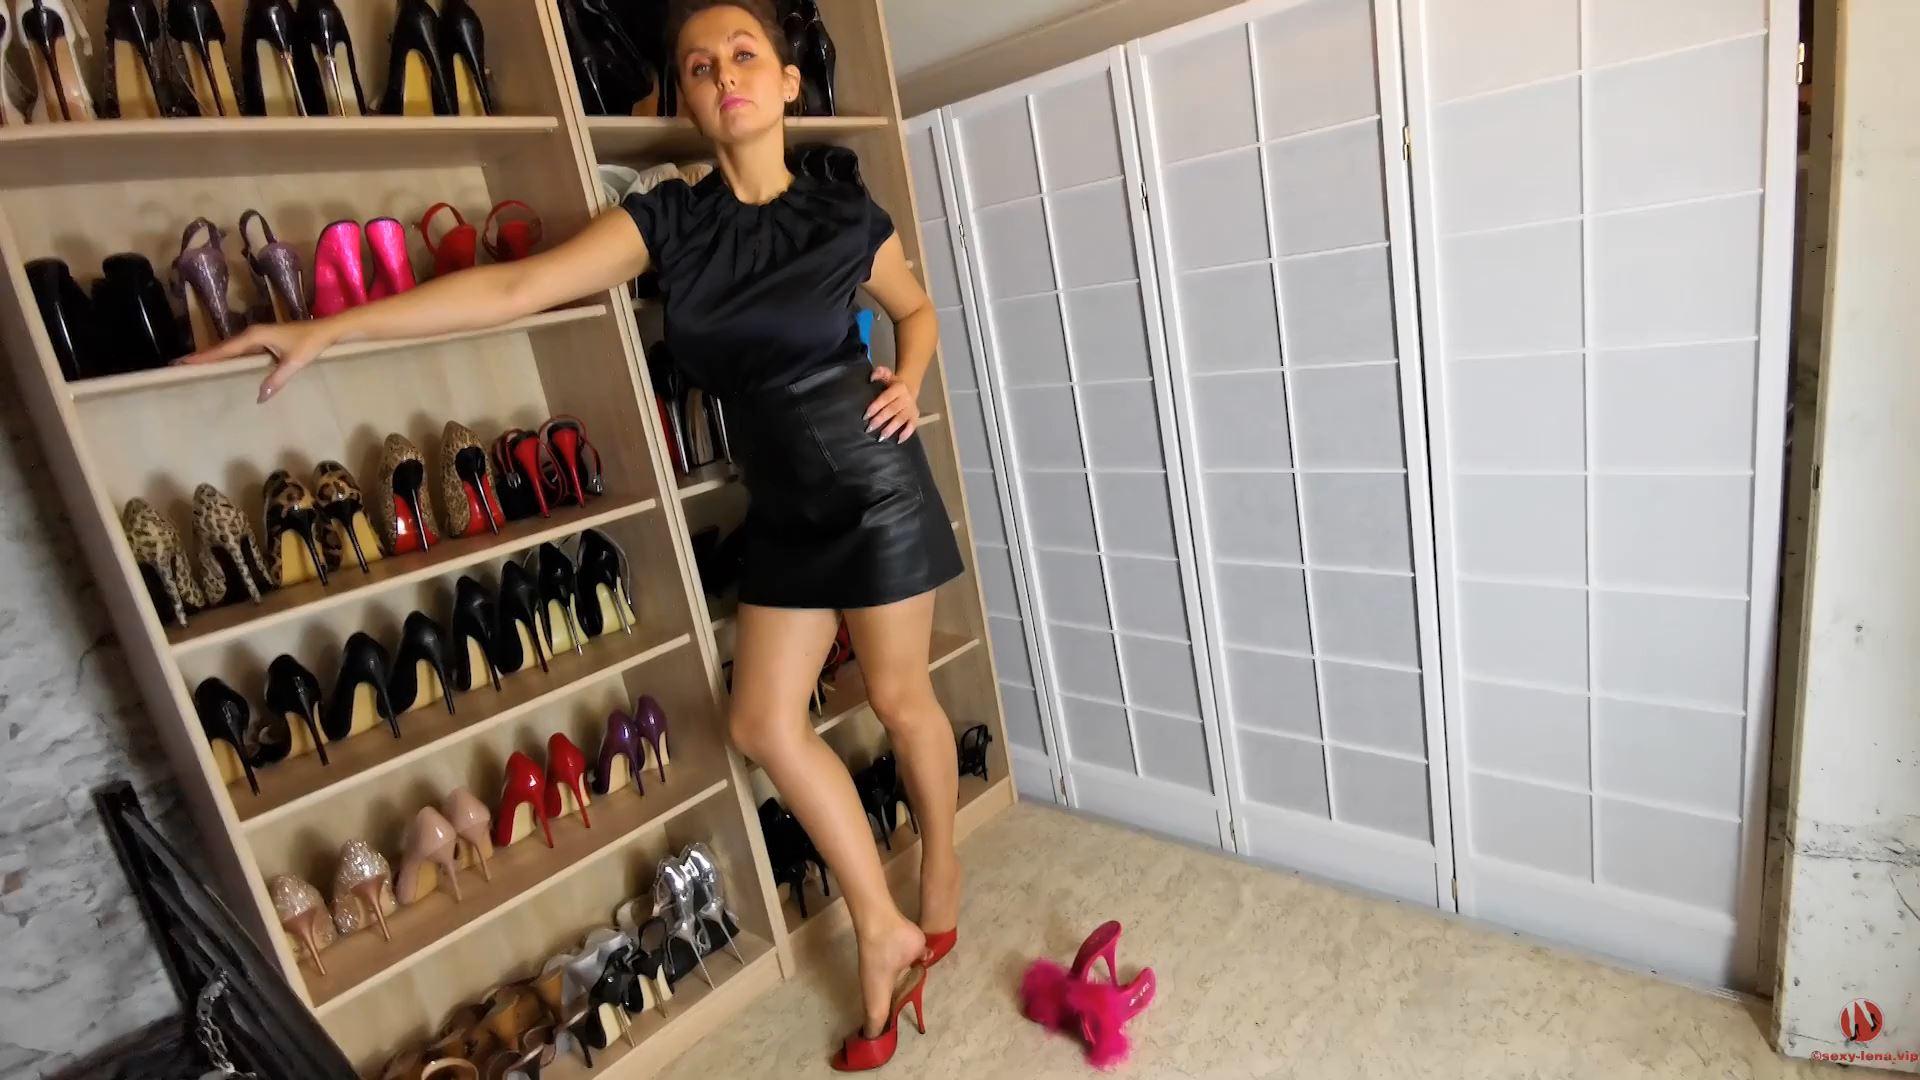 Fetish Model Lena In Scene: My Shoe Collection - SEXY LENA VIP - FULL HD/1080p/MP4